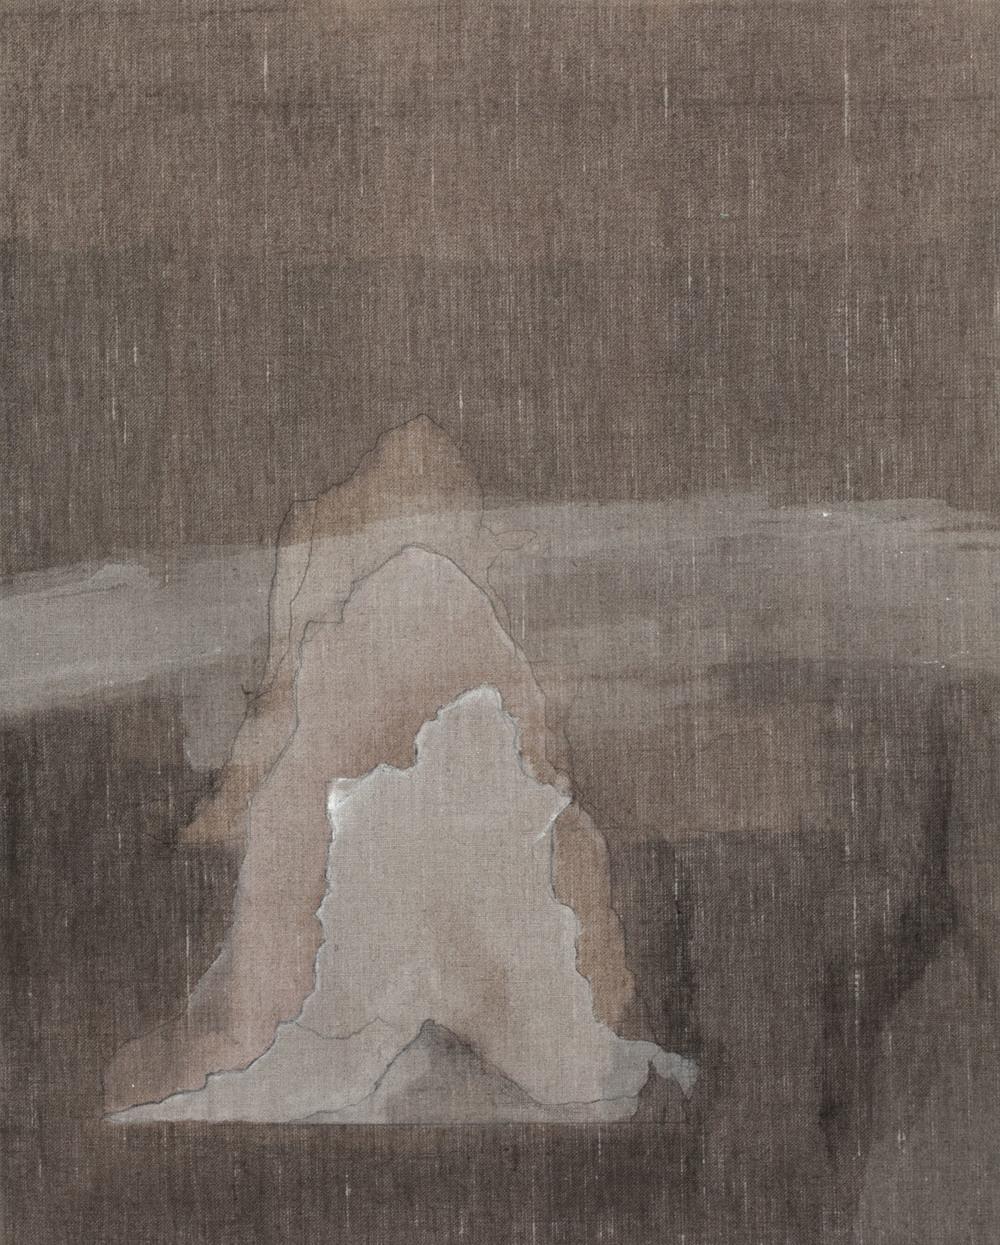 Colette Murphy_-_Untitled VII.jpg